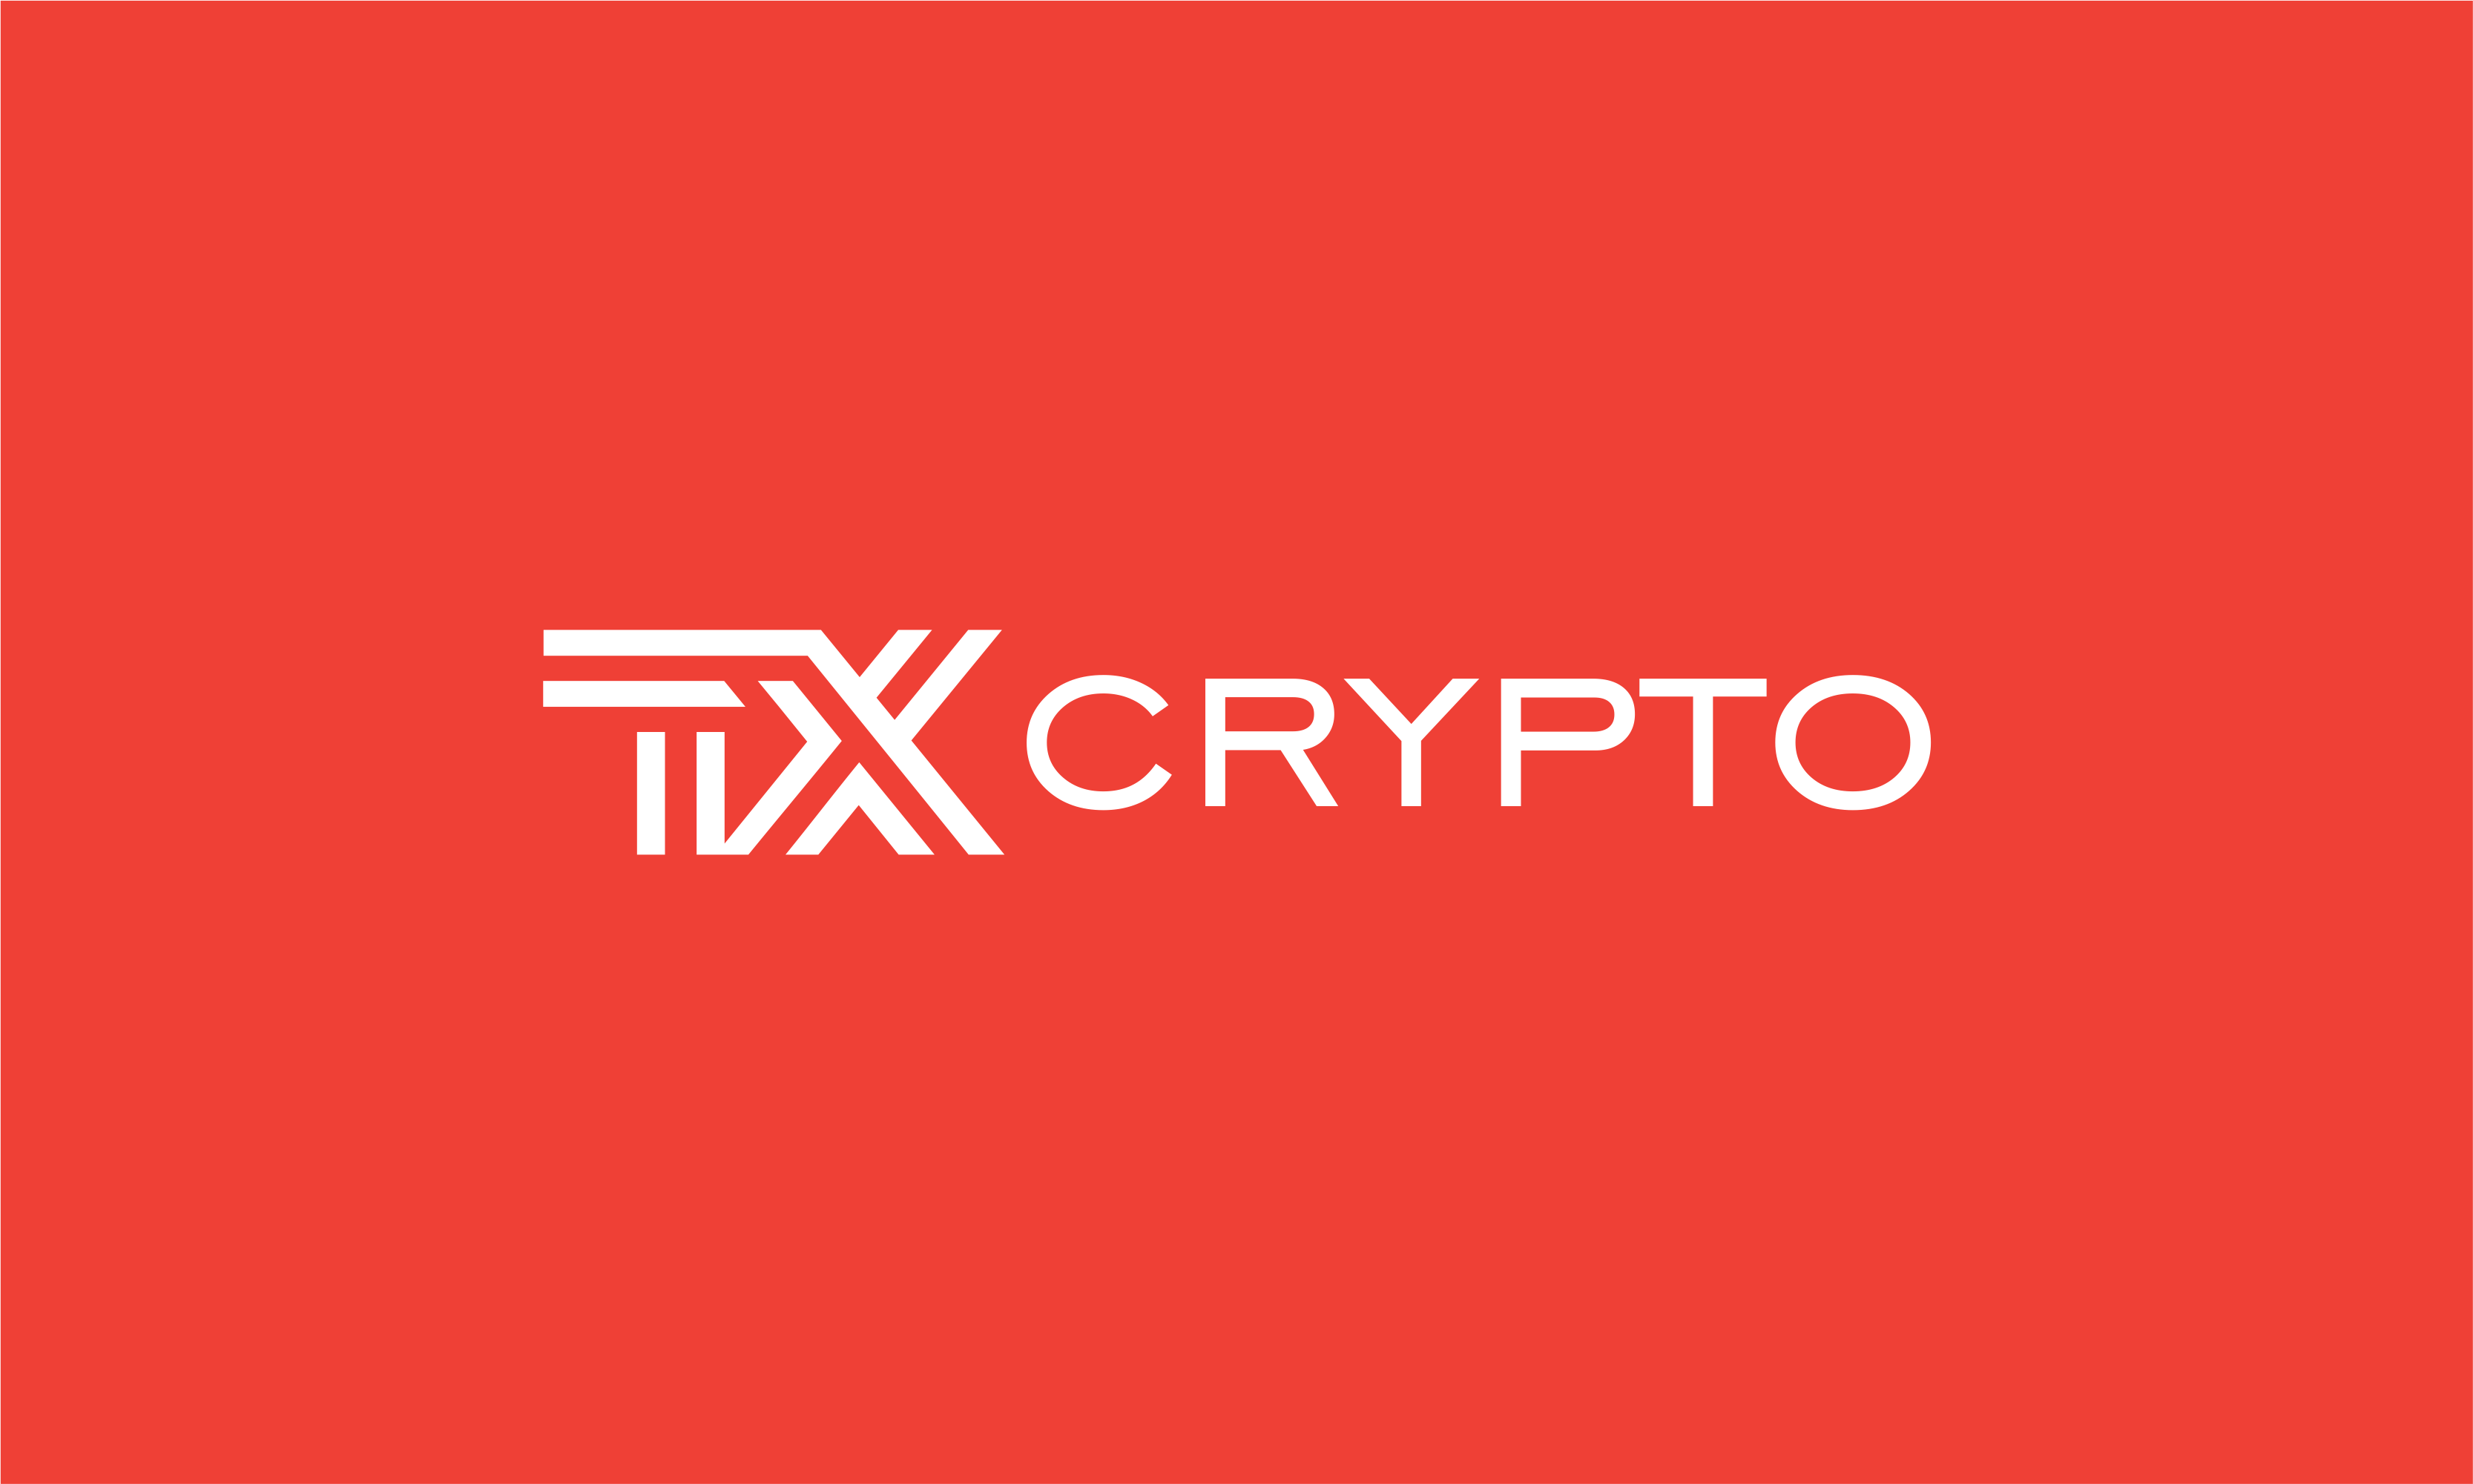 Txcrypto